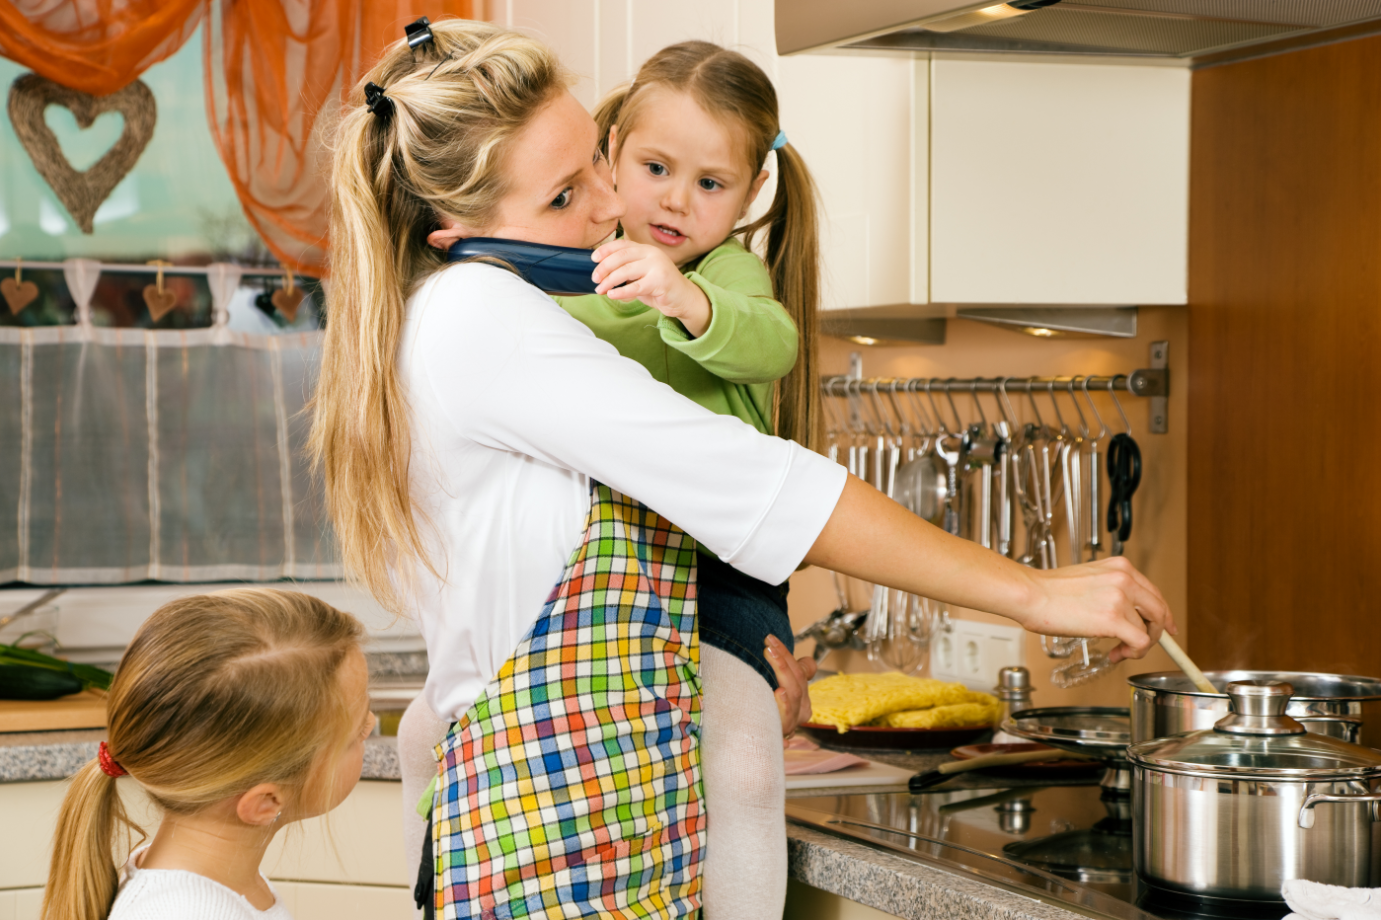 Mama kocht mit Kind auf dem Arm